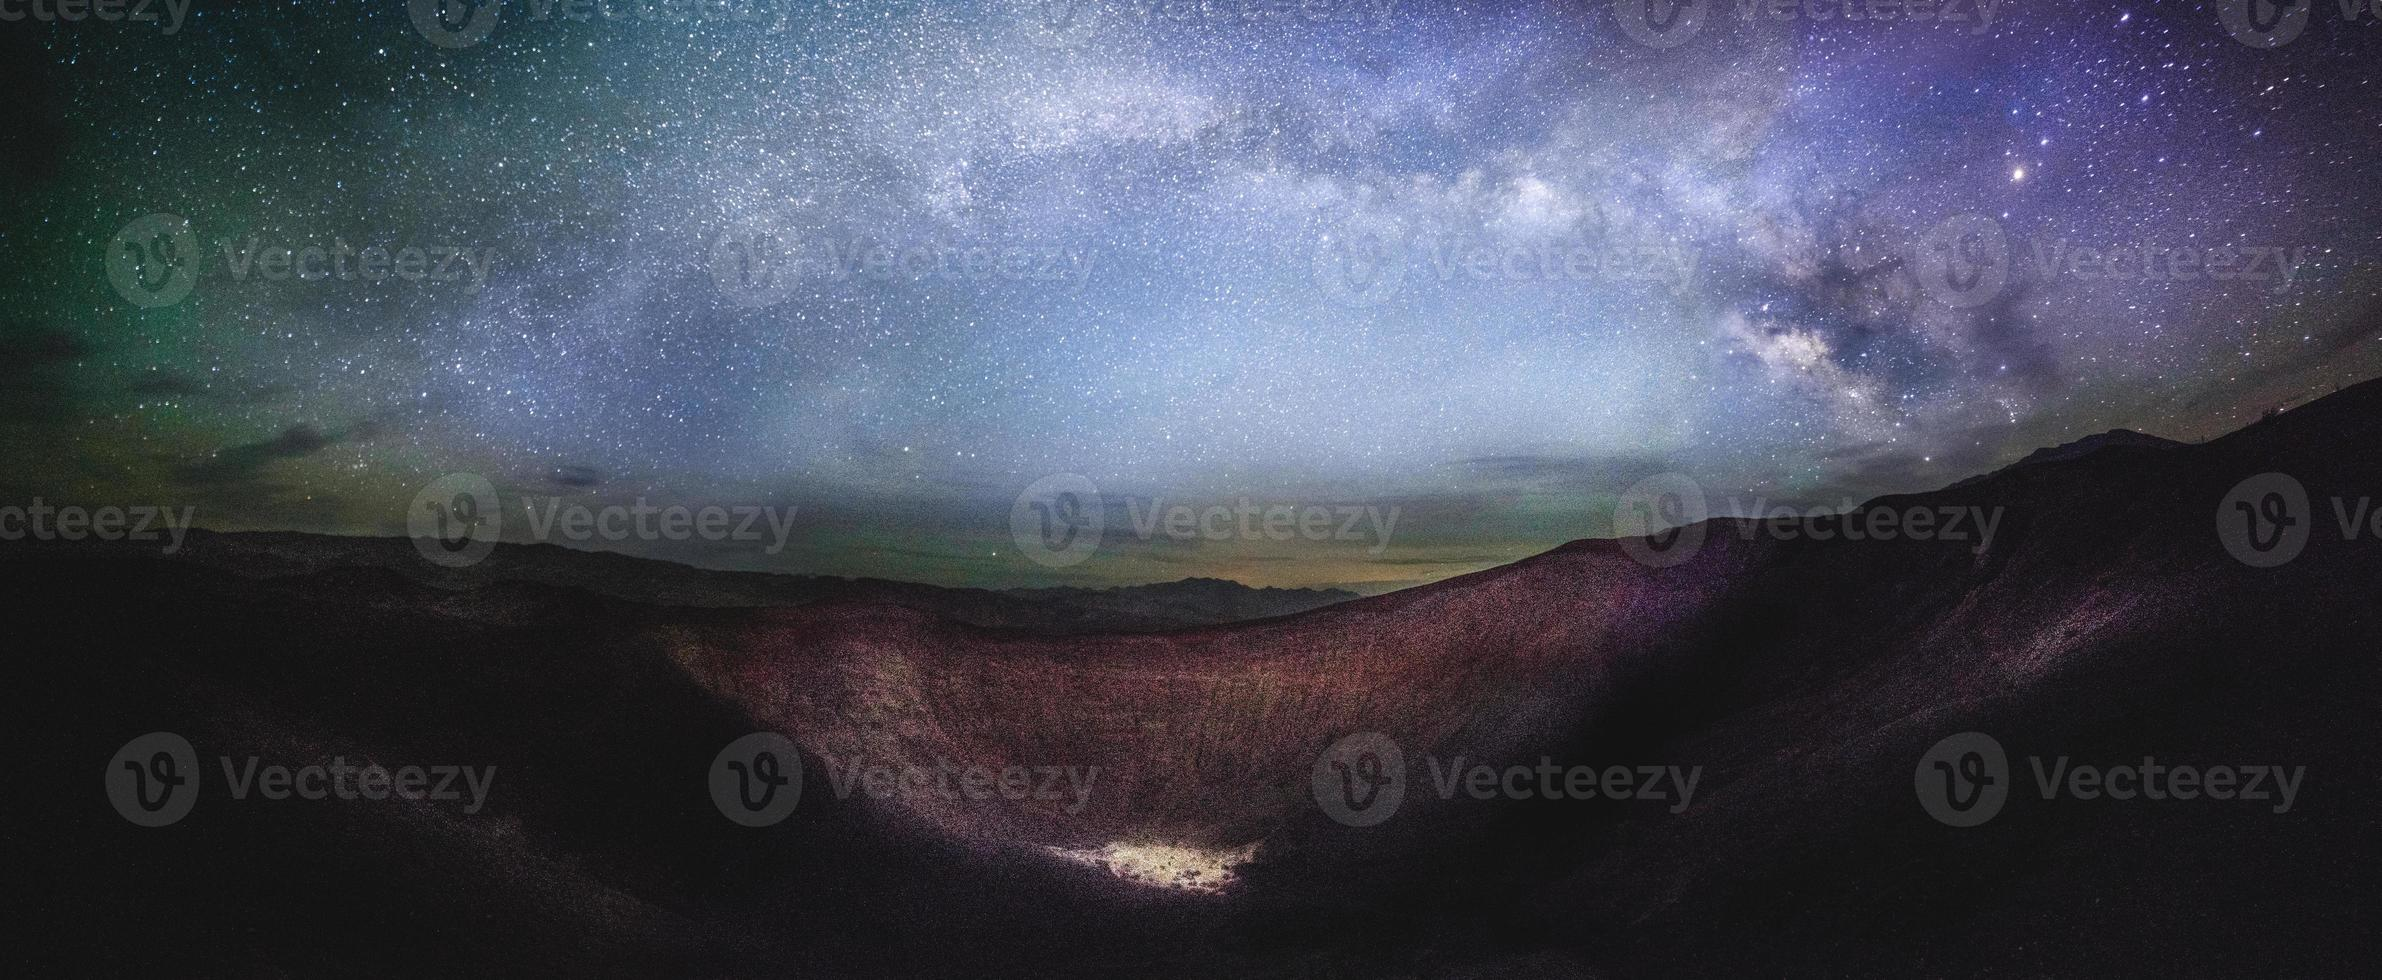 ubehebe kraterpanorama med mjölkvägspanorama foto